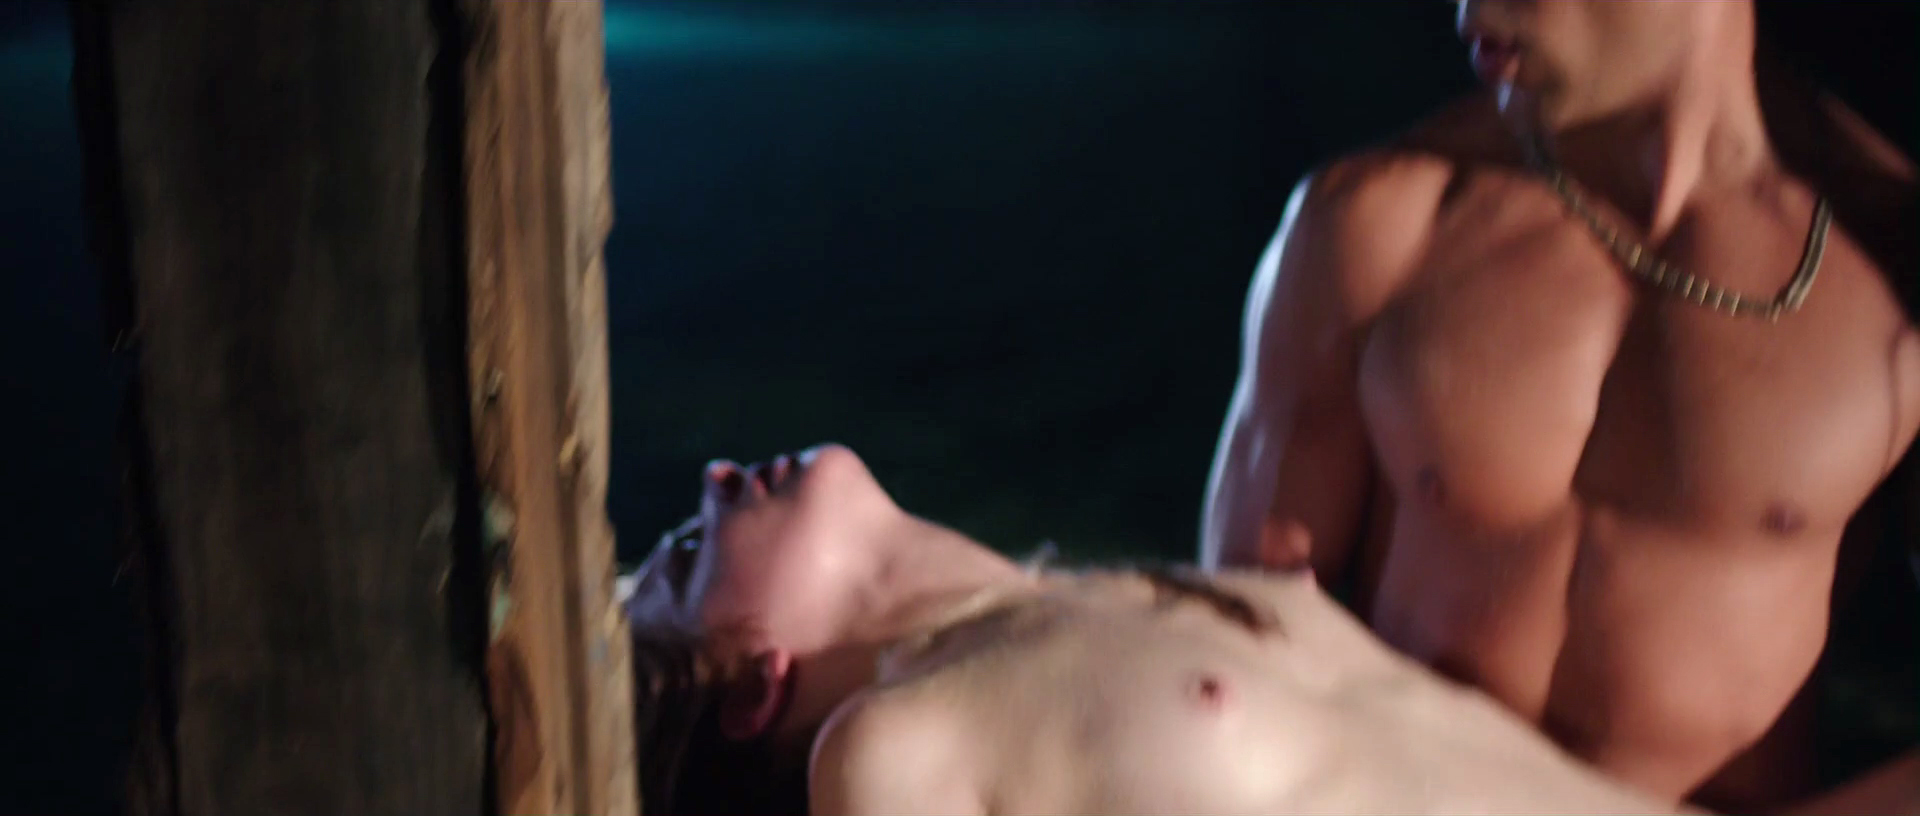 Josefine preuß nackt das sacher